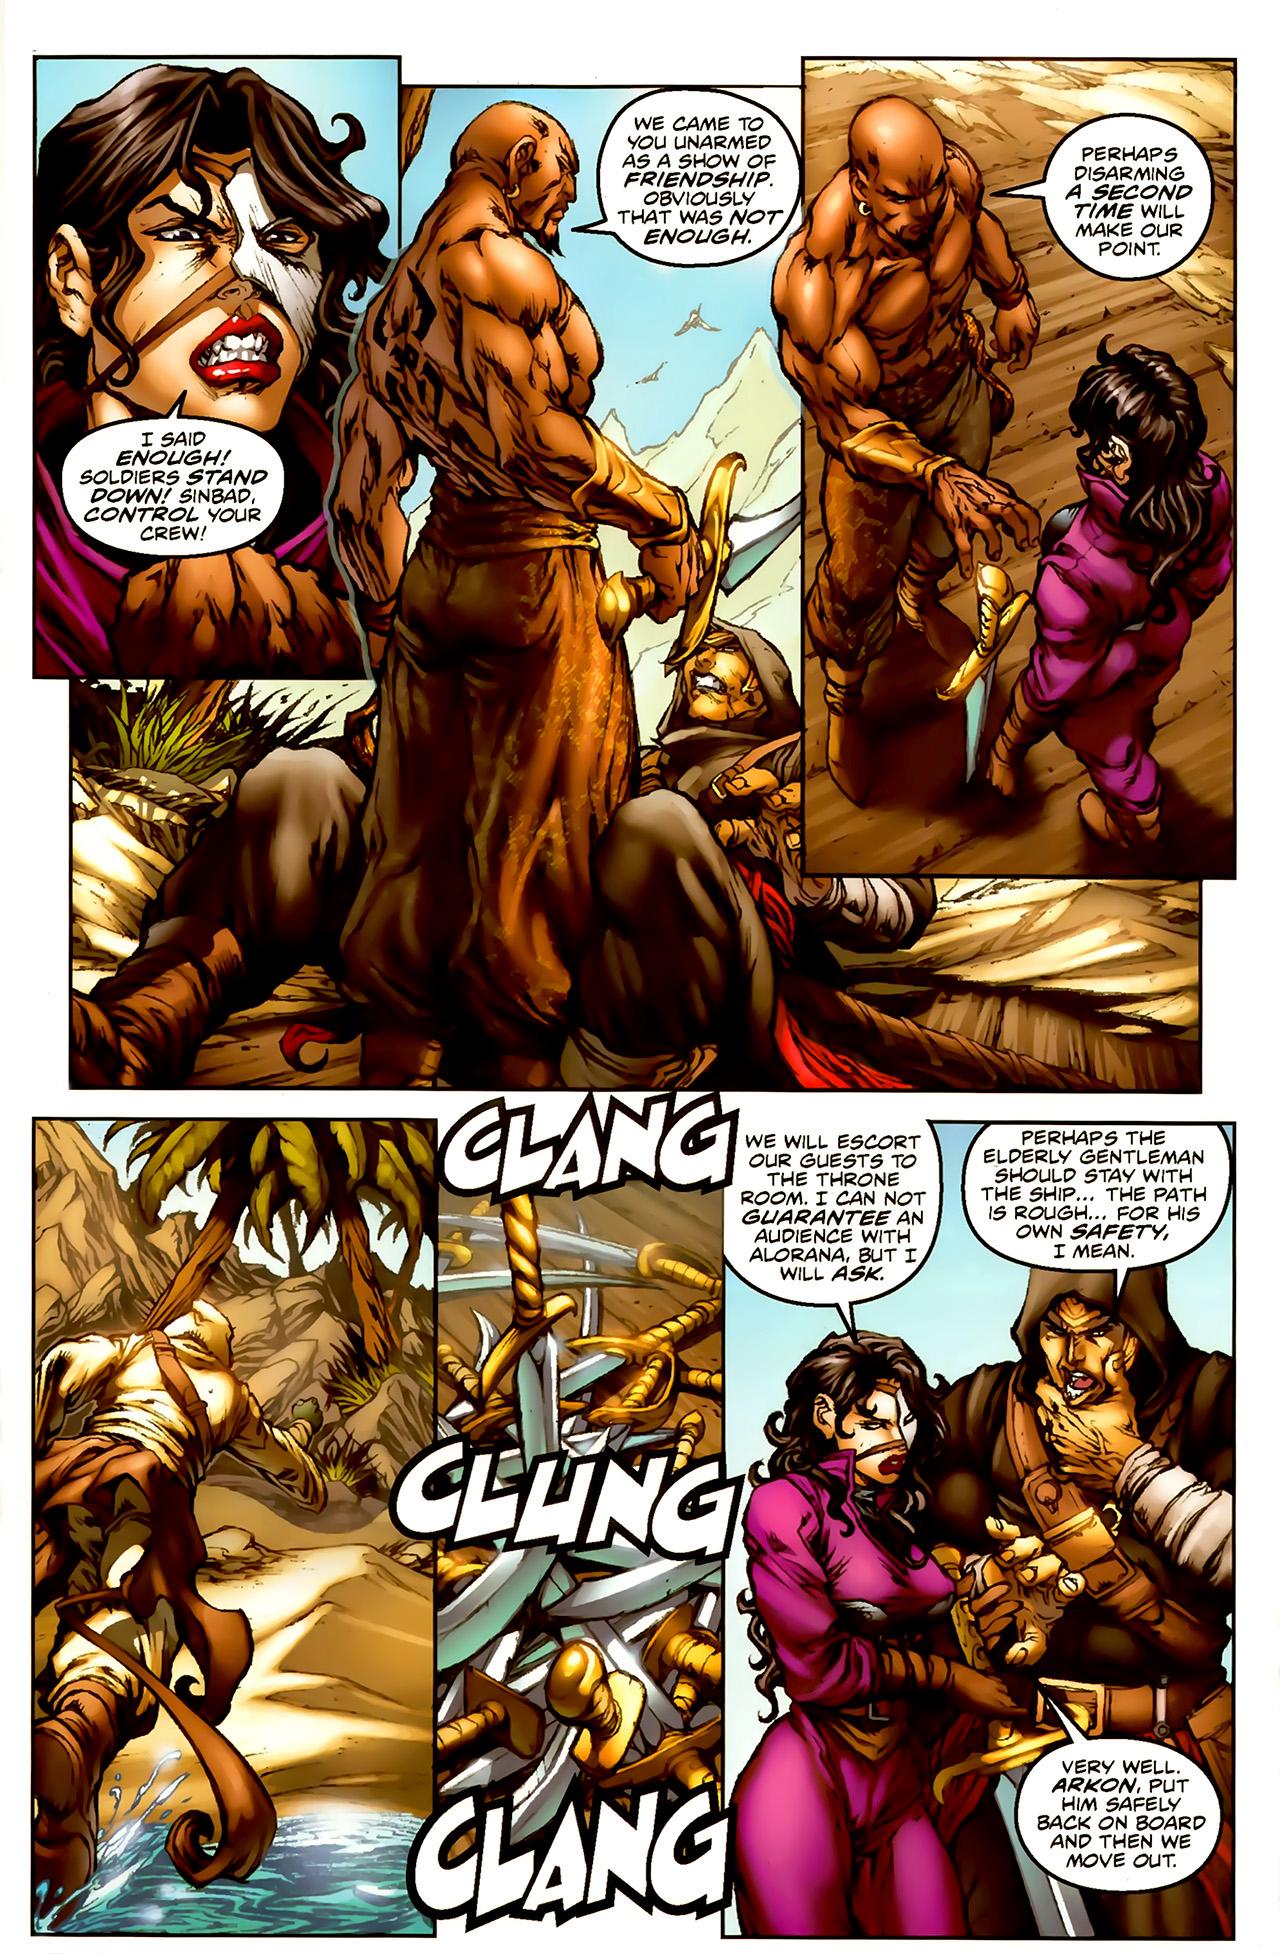 Read online 1001 Arabian Nights: The Adventures of Sinbad comic -  Issue #1 - 14